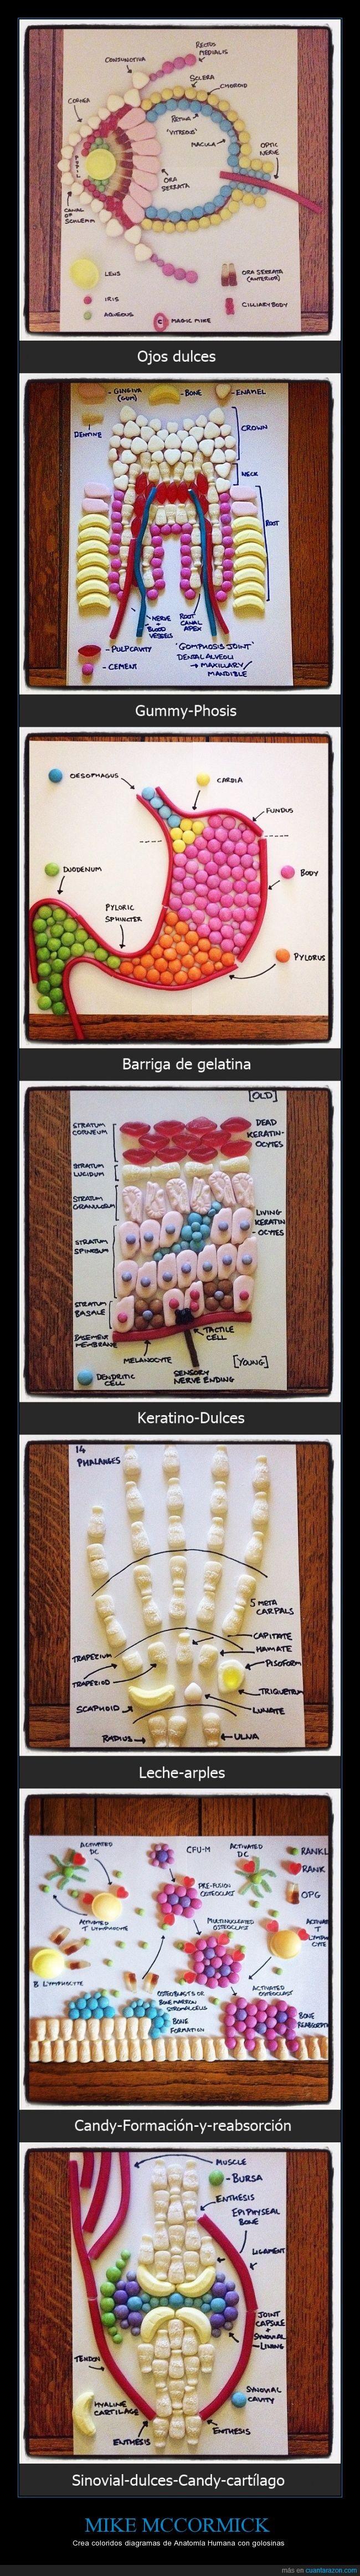 "Anatomía de golosinas,Anatomía Humana,arples,Barriga,cartílago,dulces,Escocia,estudiante de Medicina,Formación,gelatina,Glasgow,Gummy-Phosis,Keratino,Leche,Mike McCormick,Ojos,reabsorción,Sinovial,""Candy Anatomy"""